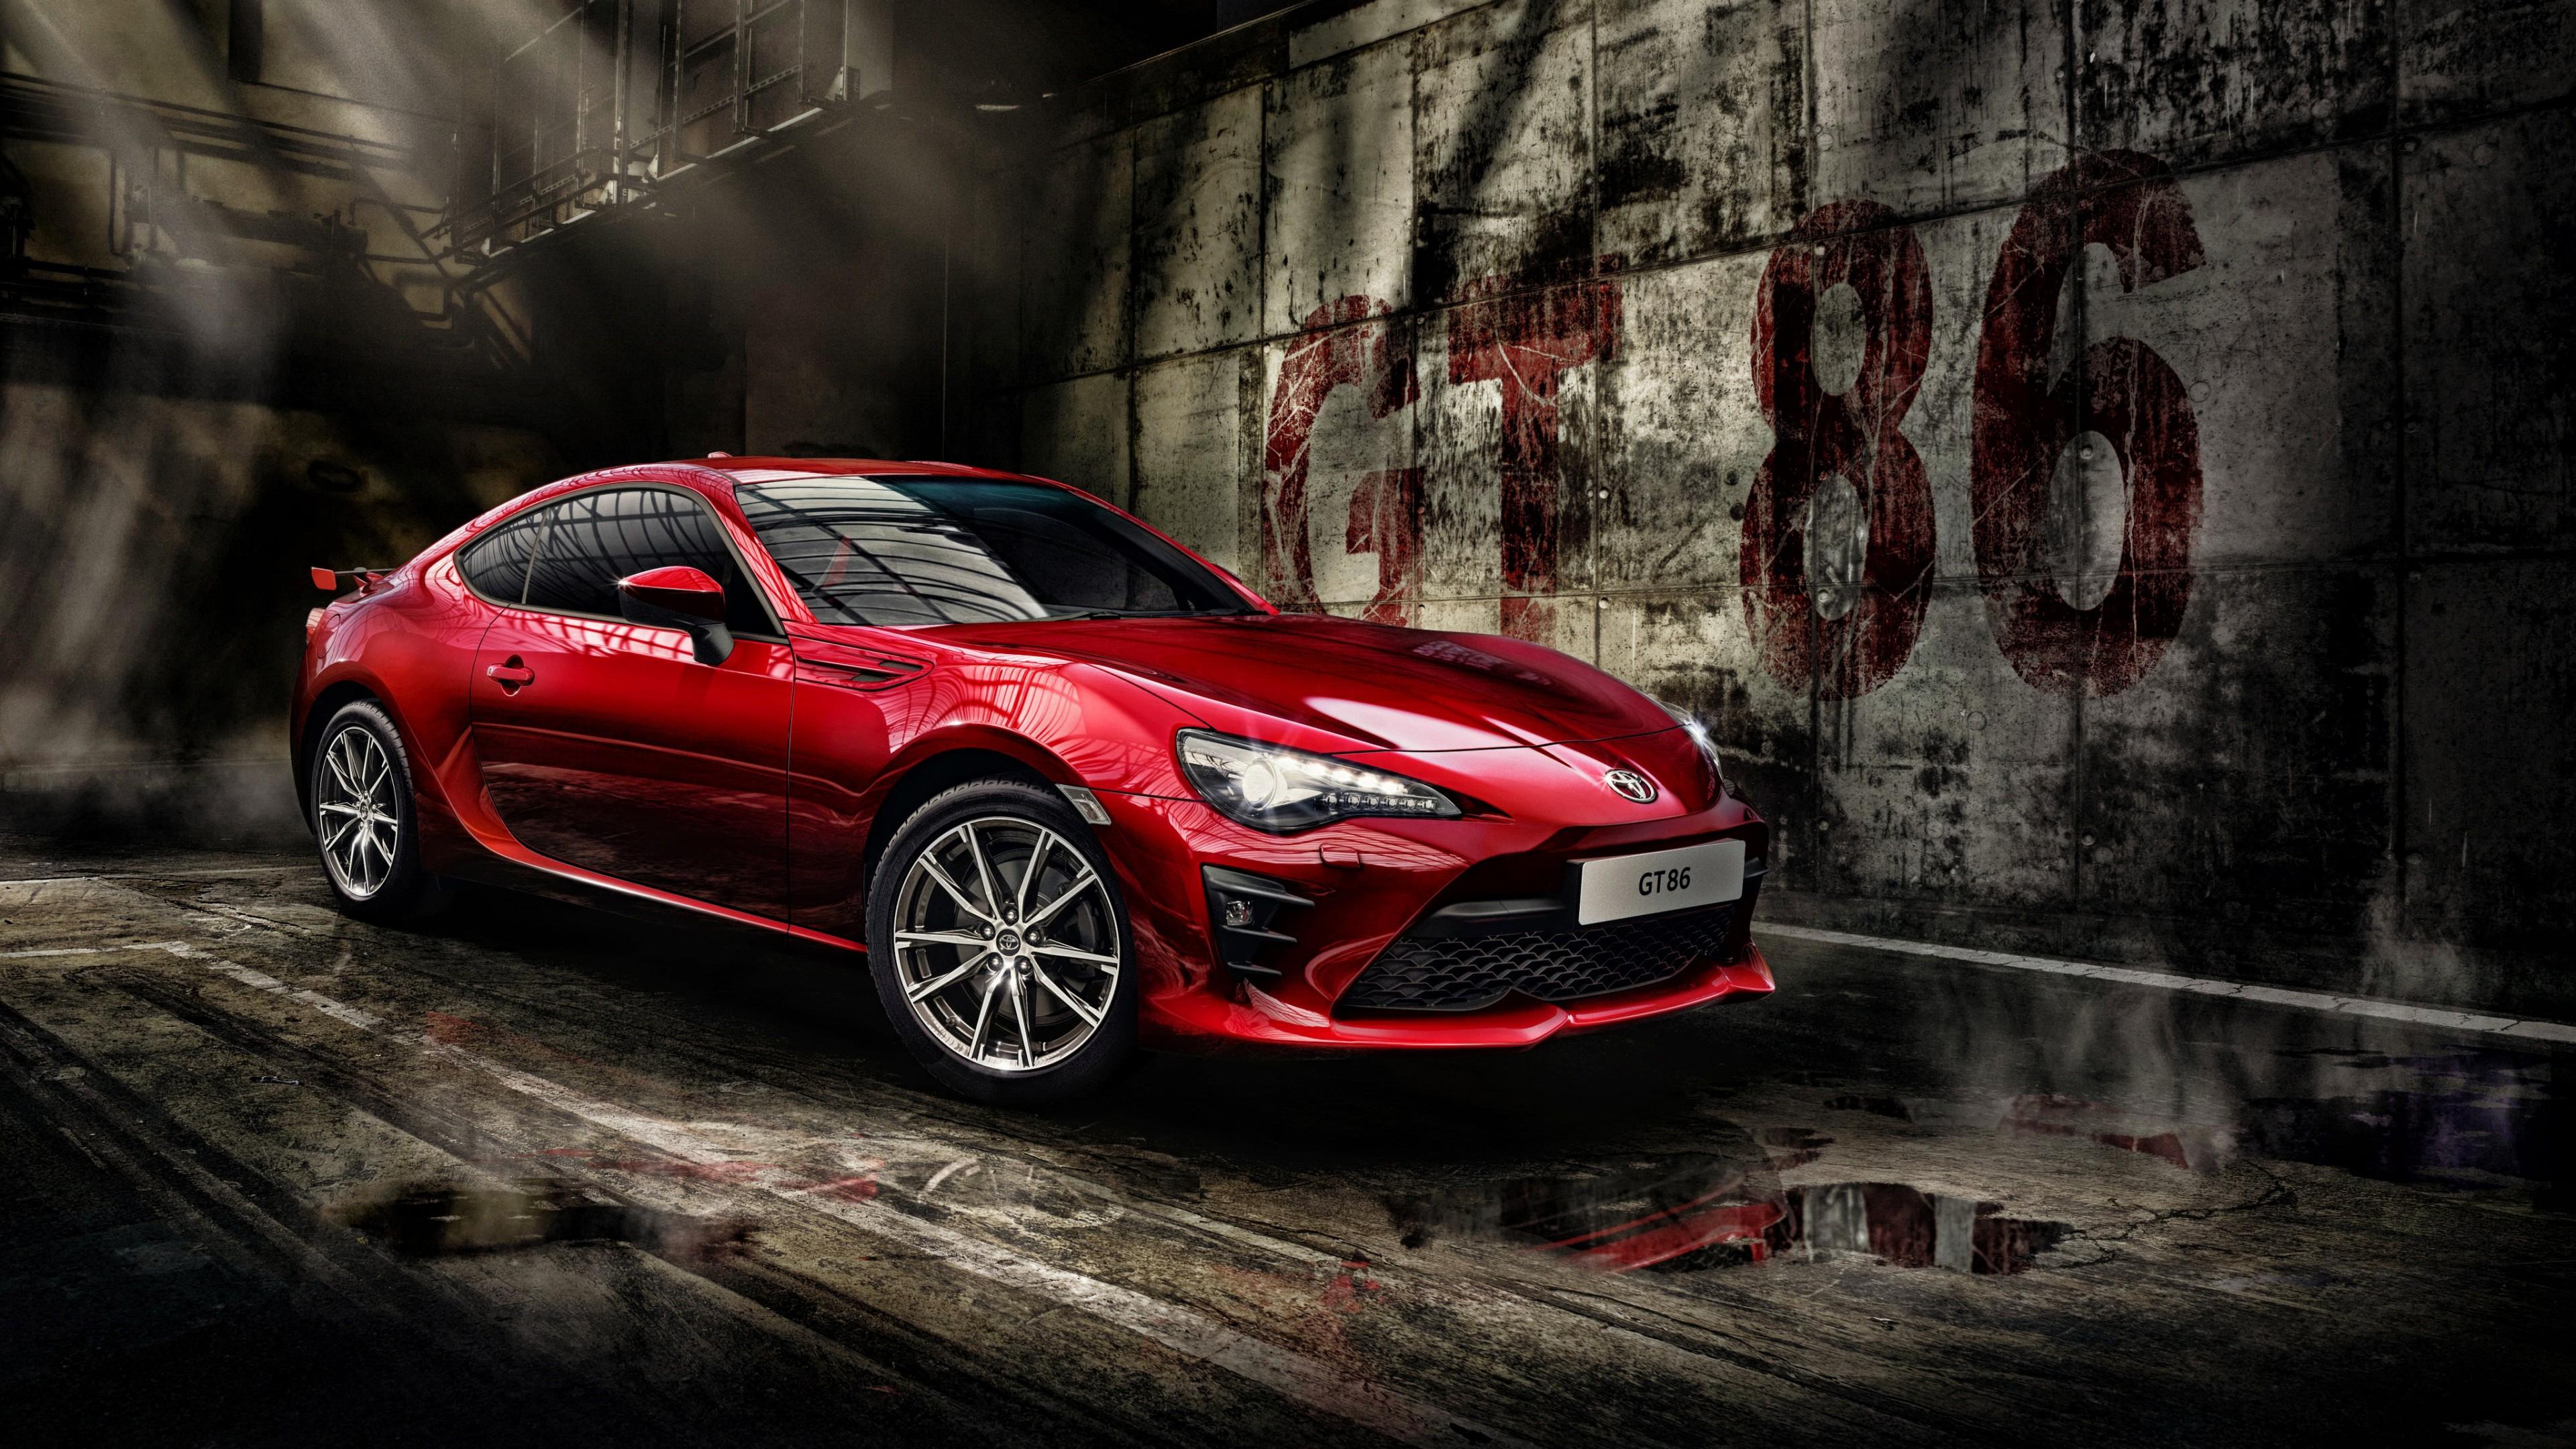 2017 Toyota 86 4K Wallpaper | HD Car Wallpapers | ID #7595